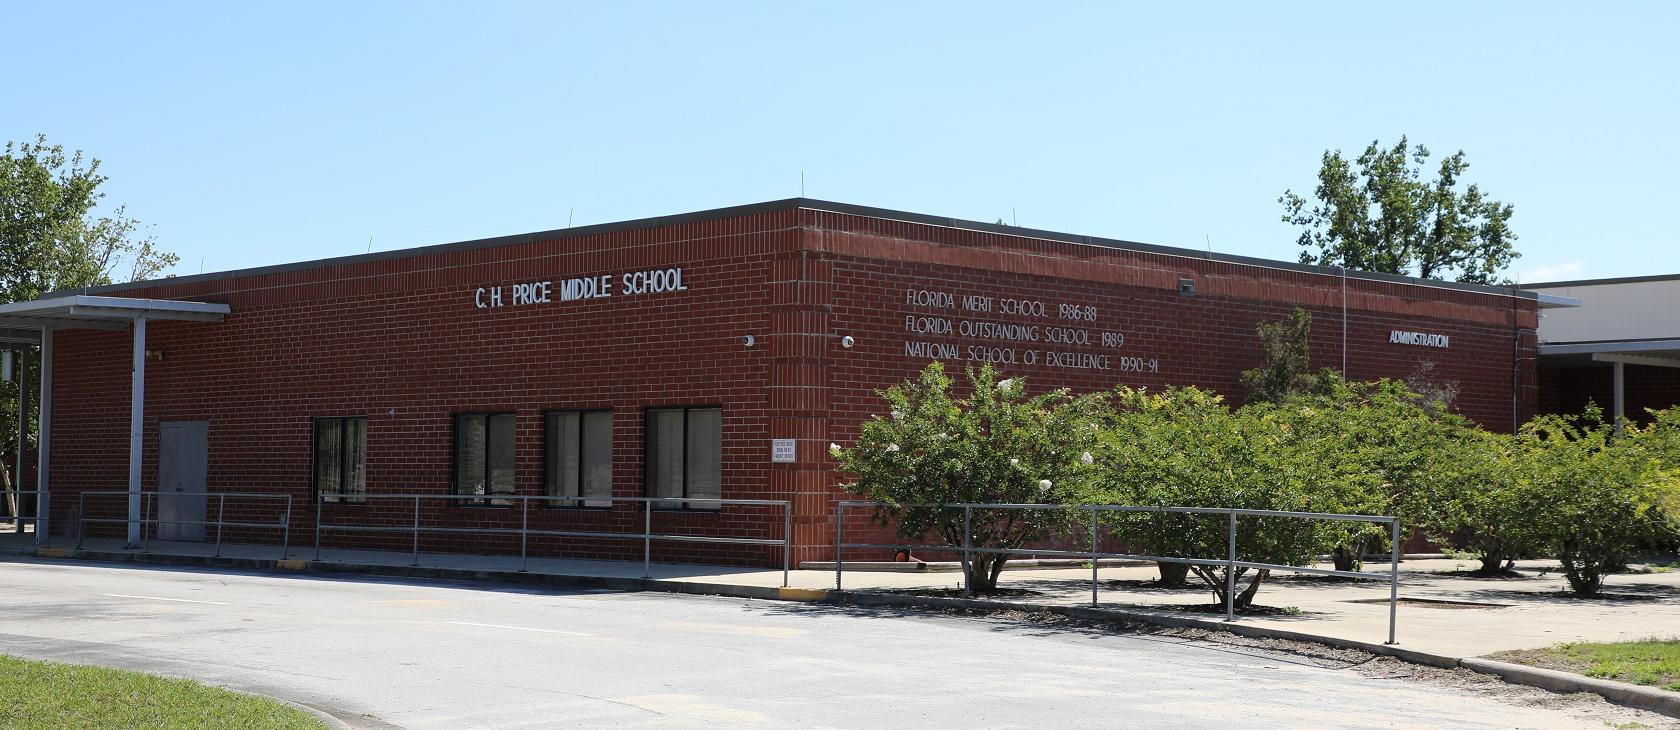 C H Price Middle School